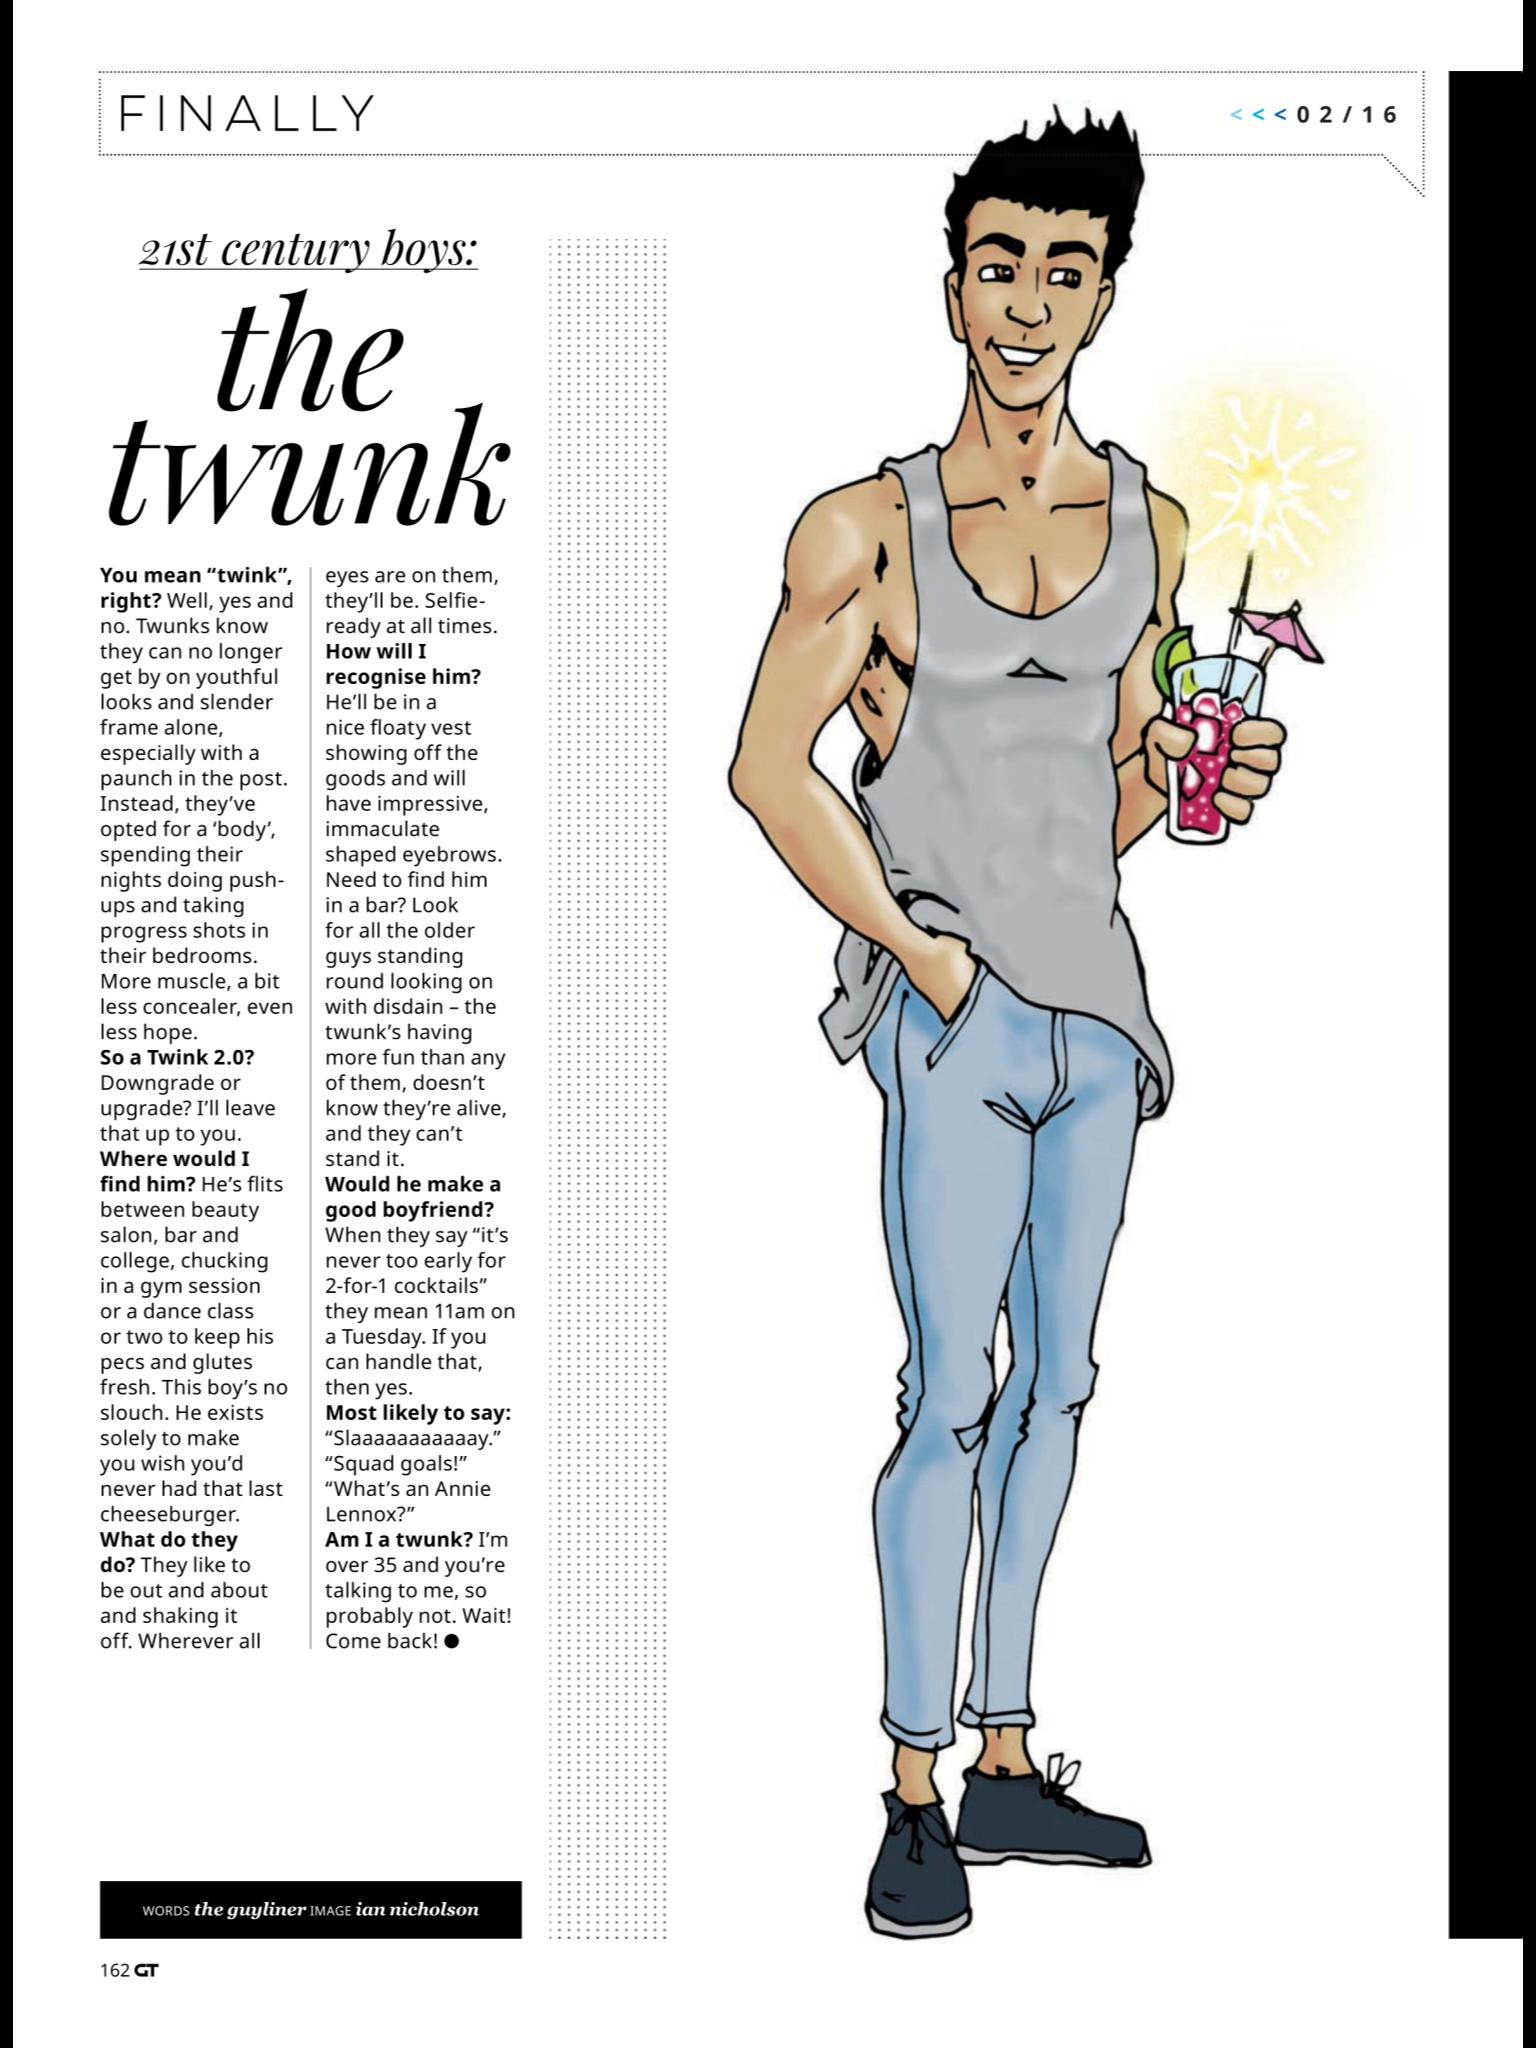 Illustration #4 The Twunk